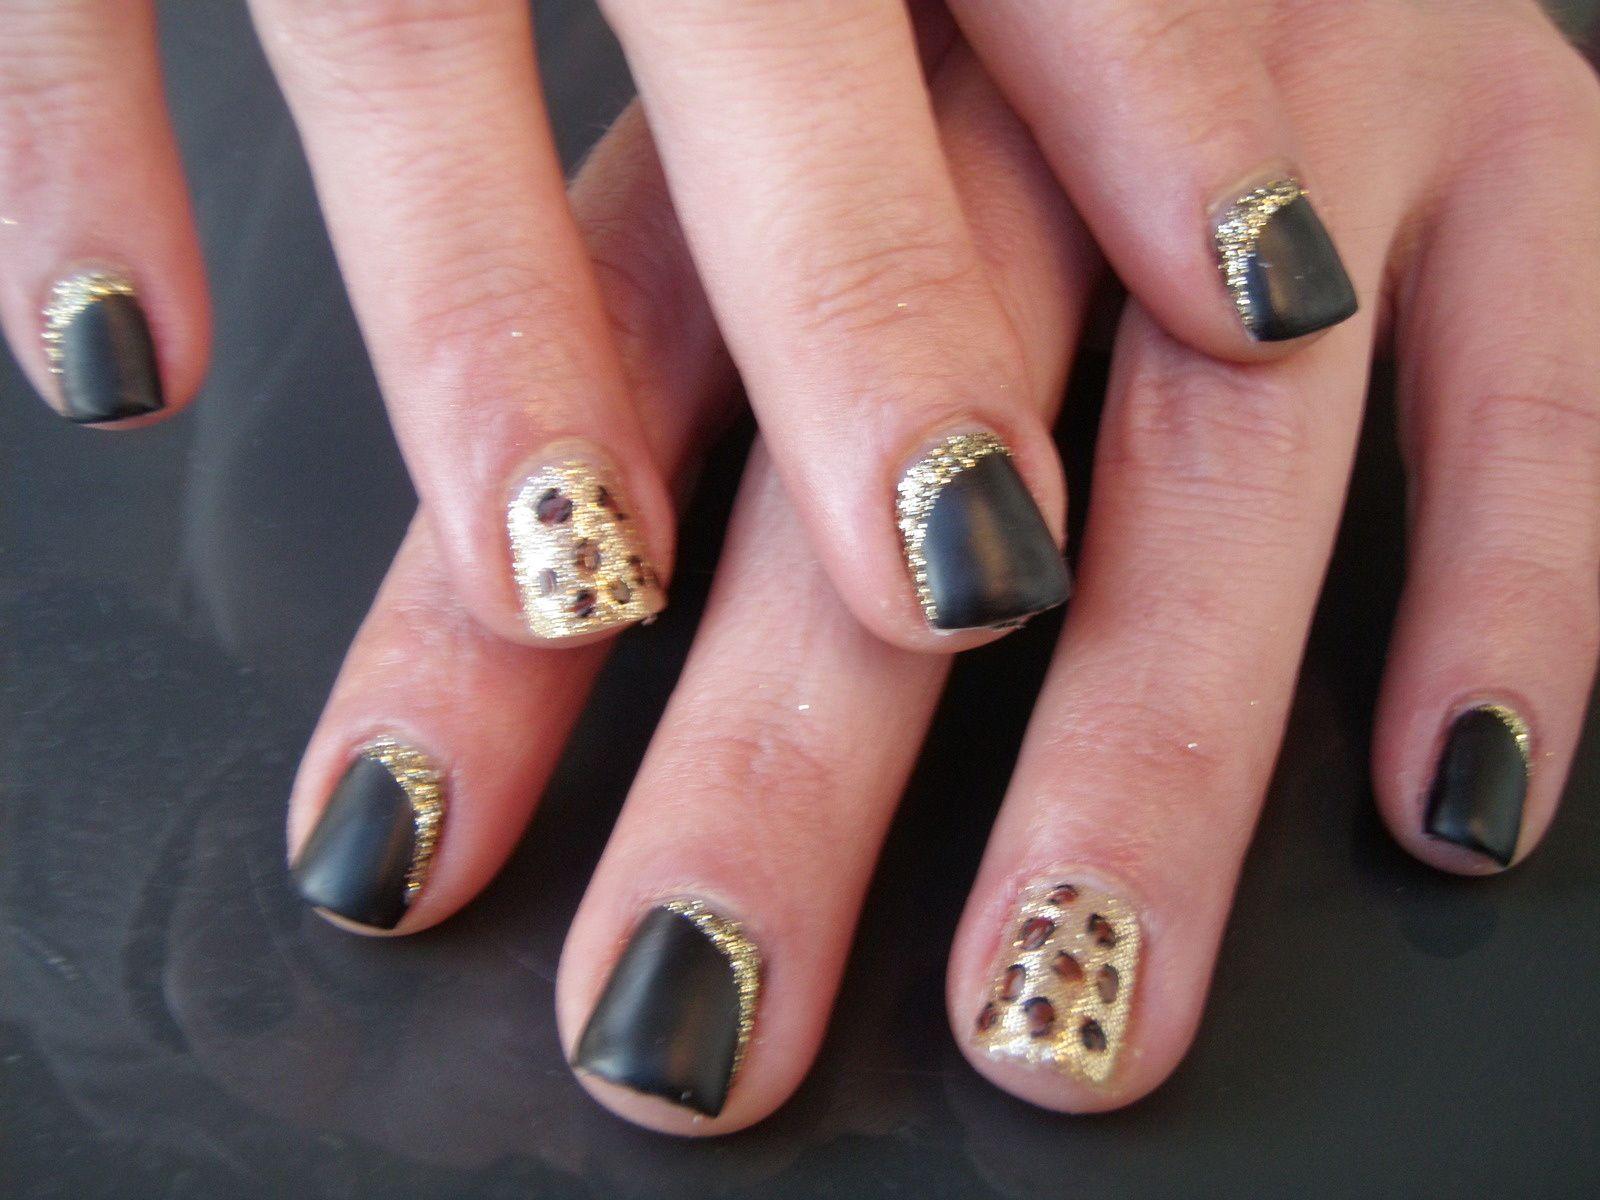 VP léopard sur ongles naturels